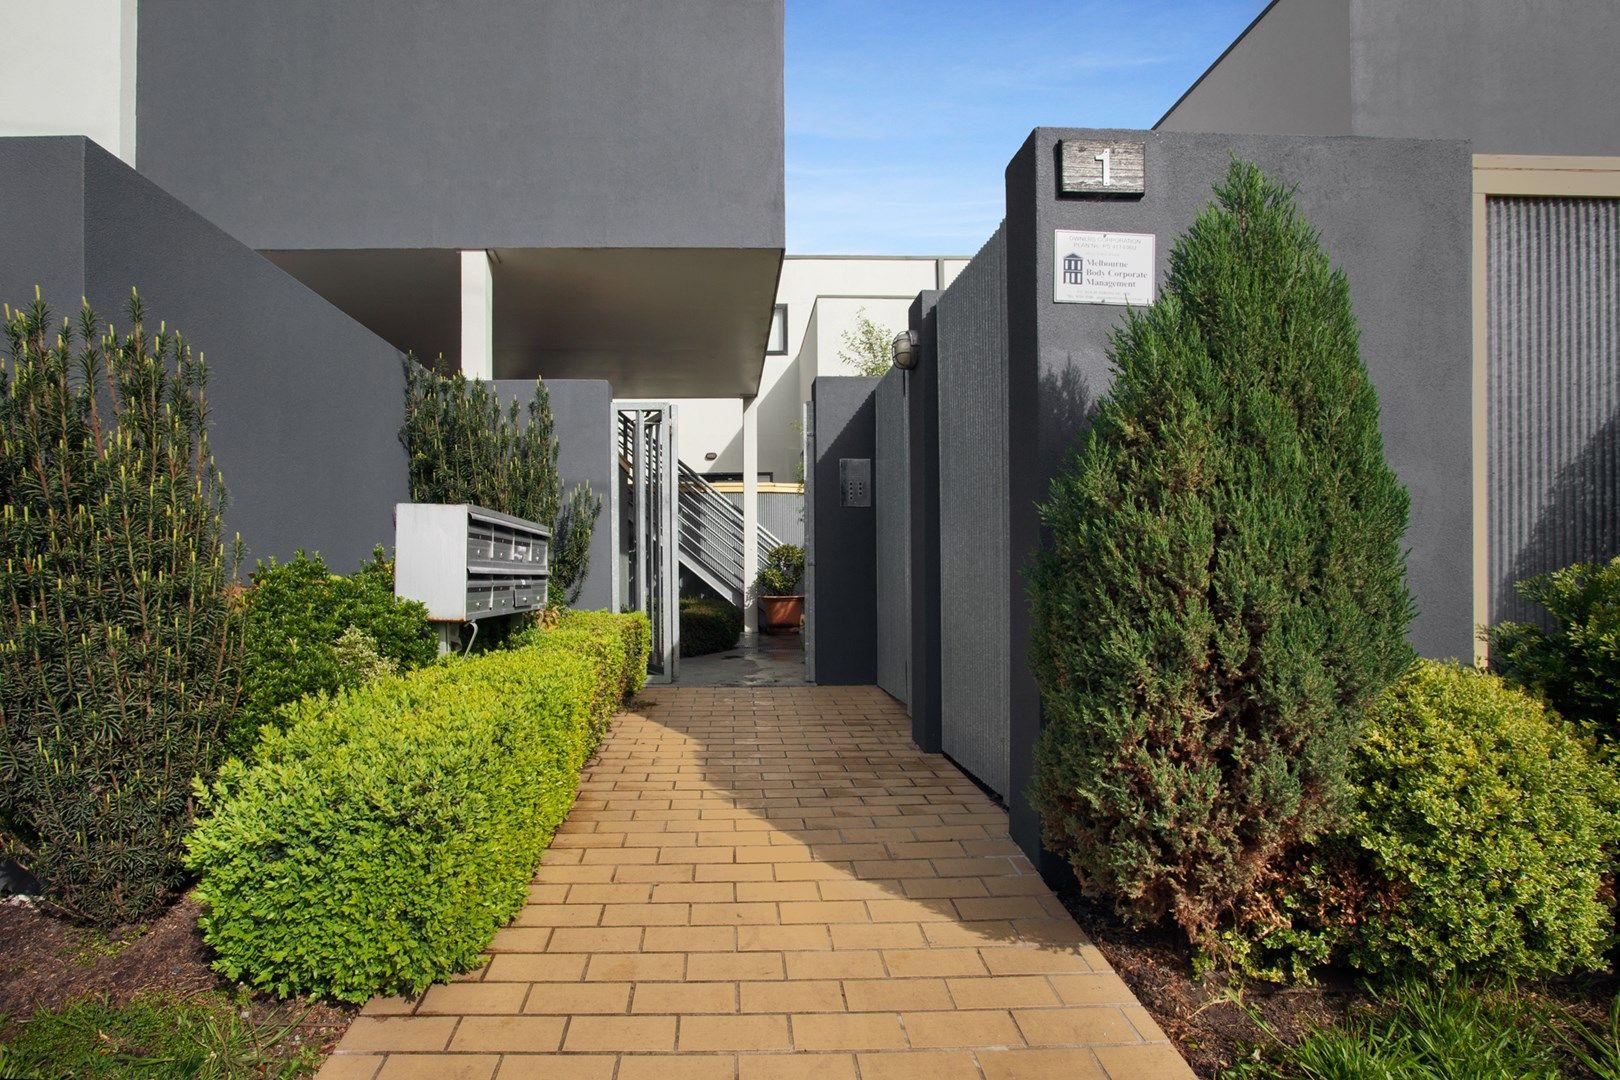 11/1 Kaye Court, Coburg VIC 3058, Image 0